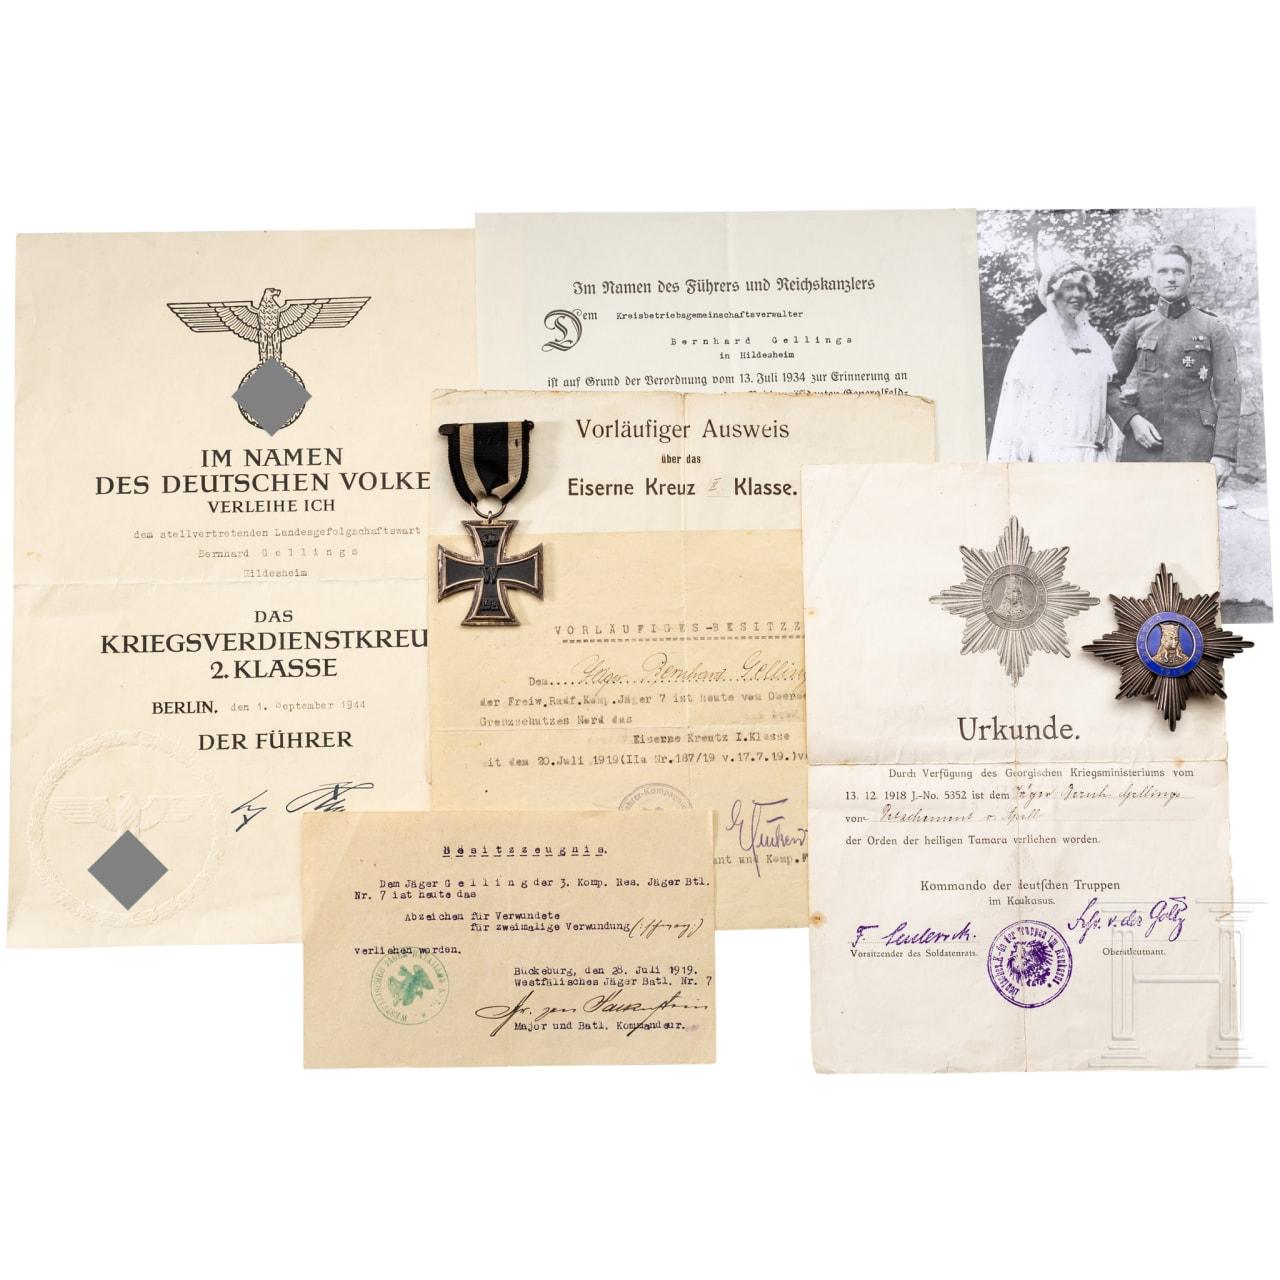 Order and document estate of the rifleman Bernhard Gellings as wearer of the Tamara order